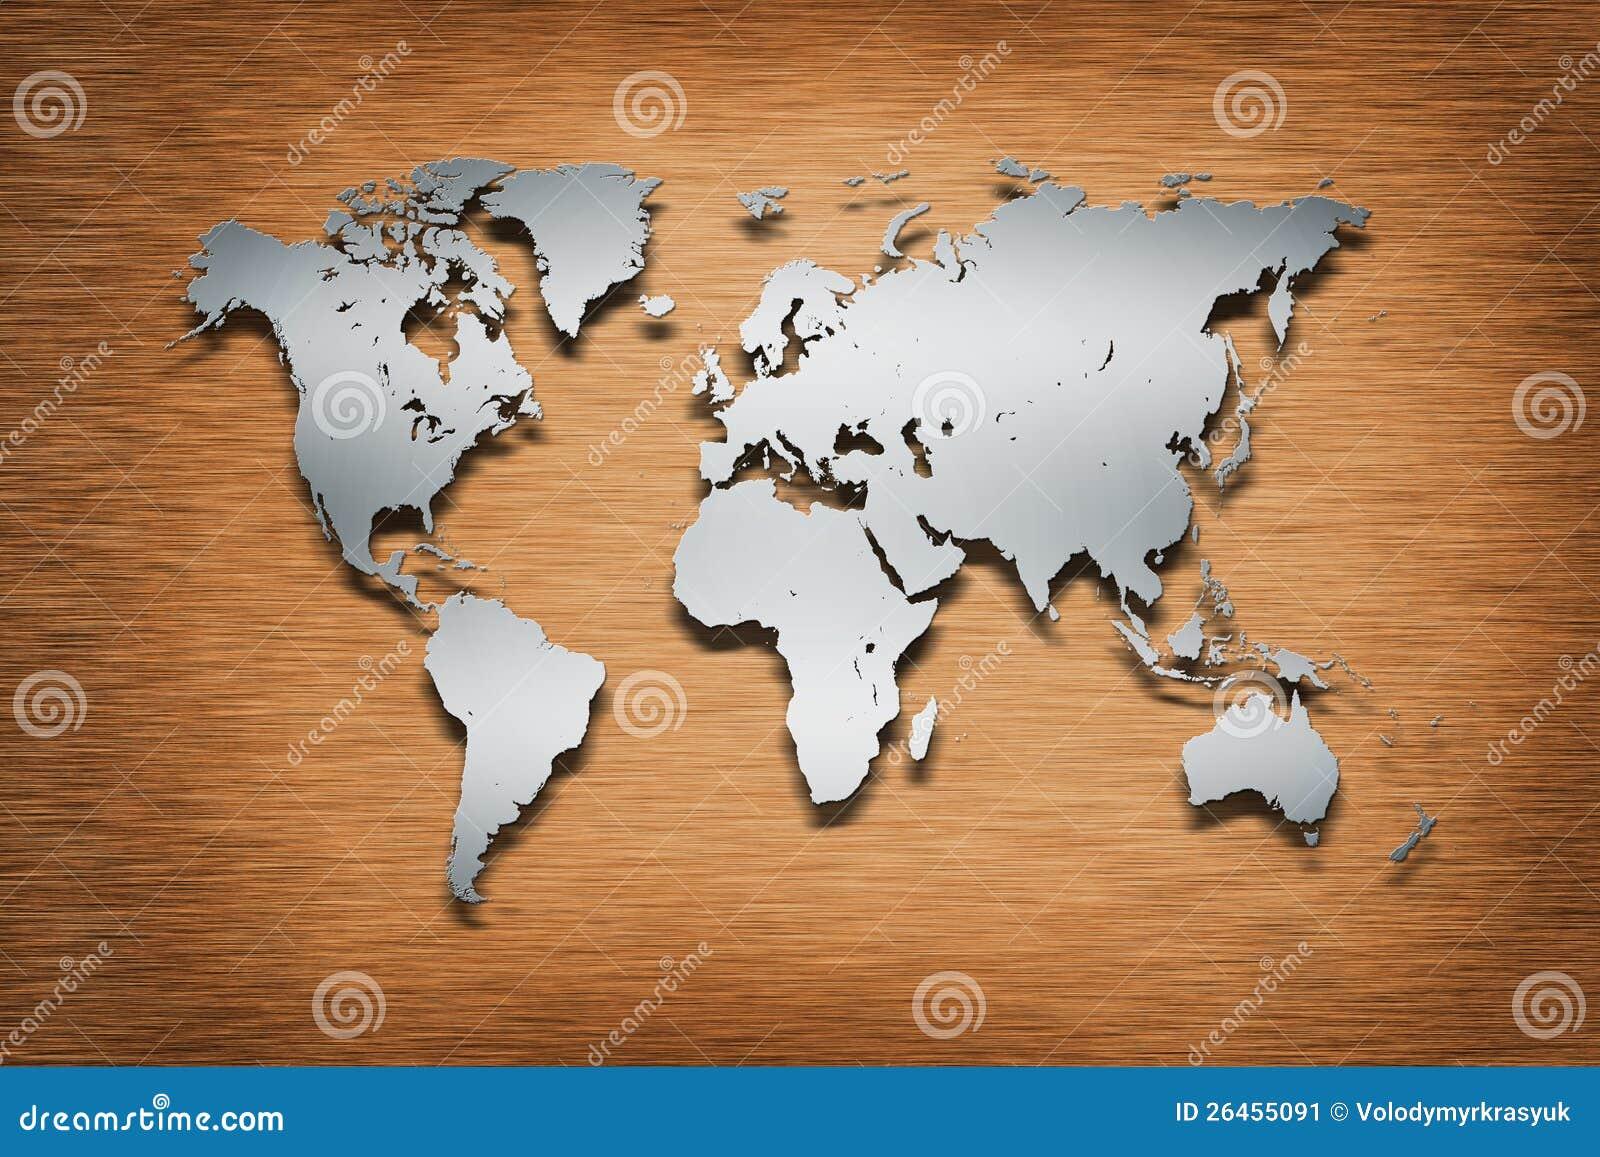 Metal world map on wood stock illustration illustration of graphic metal world map on wood gumiabroncs Gallery